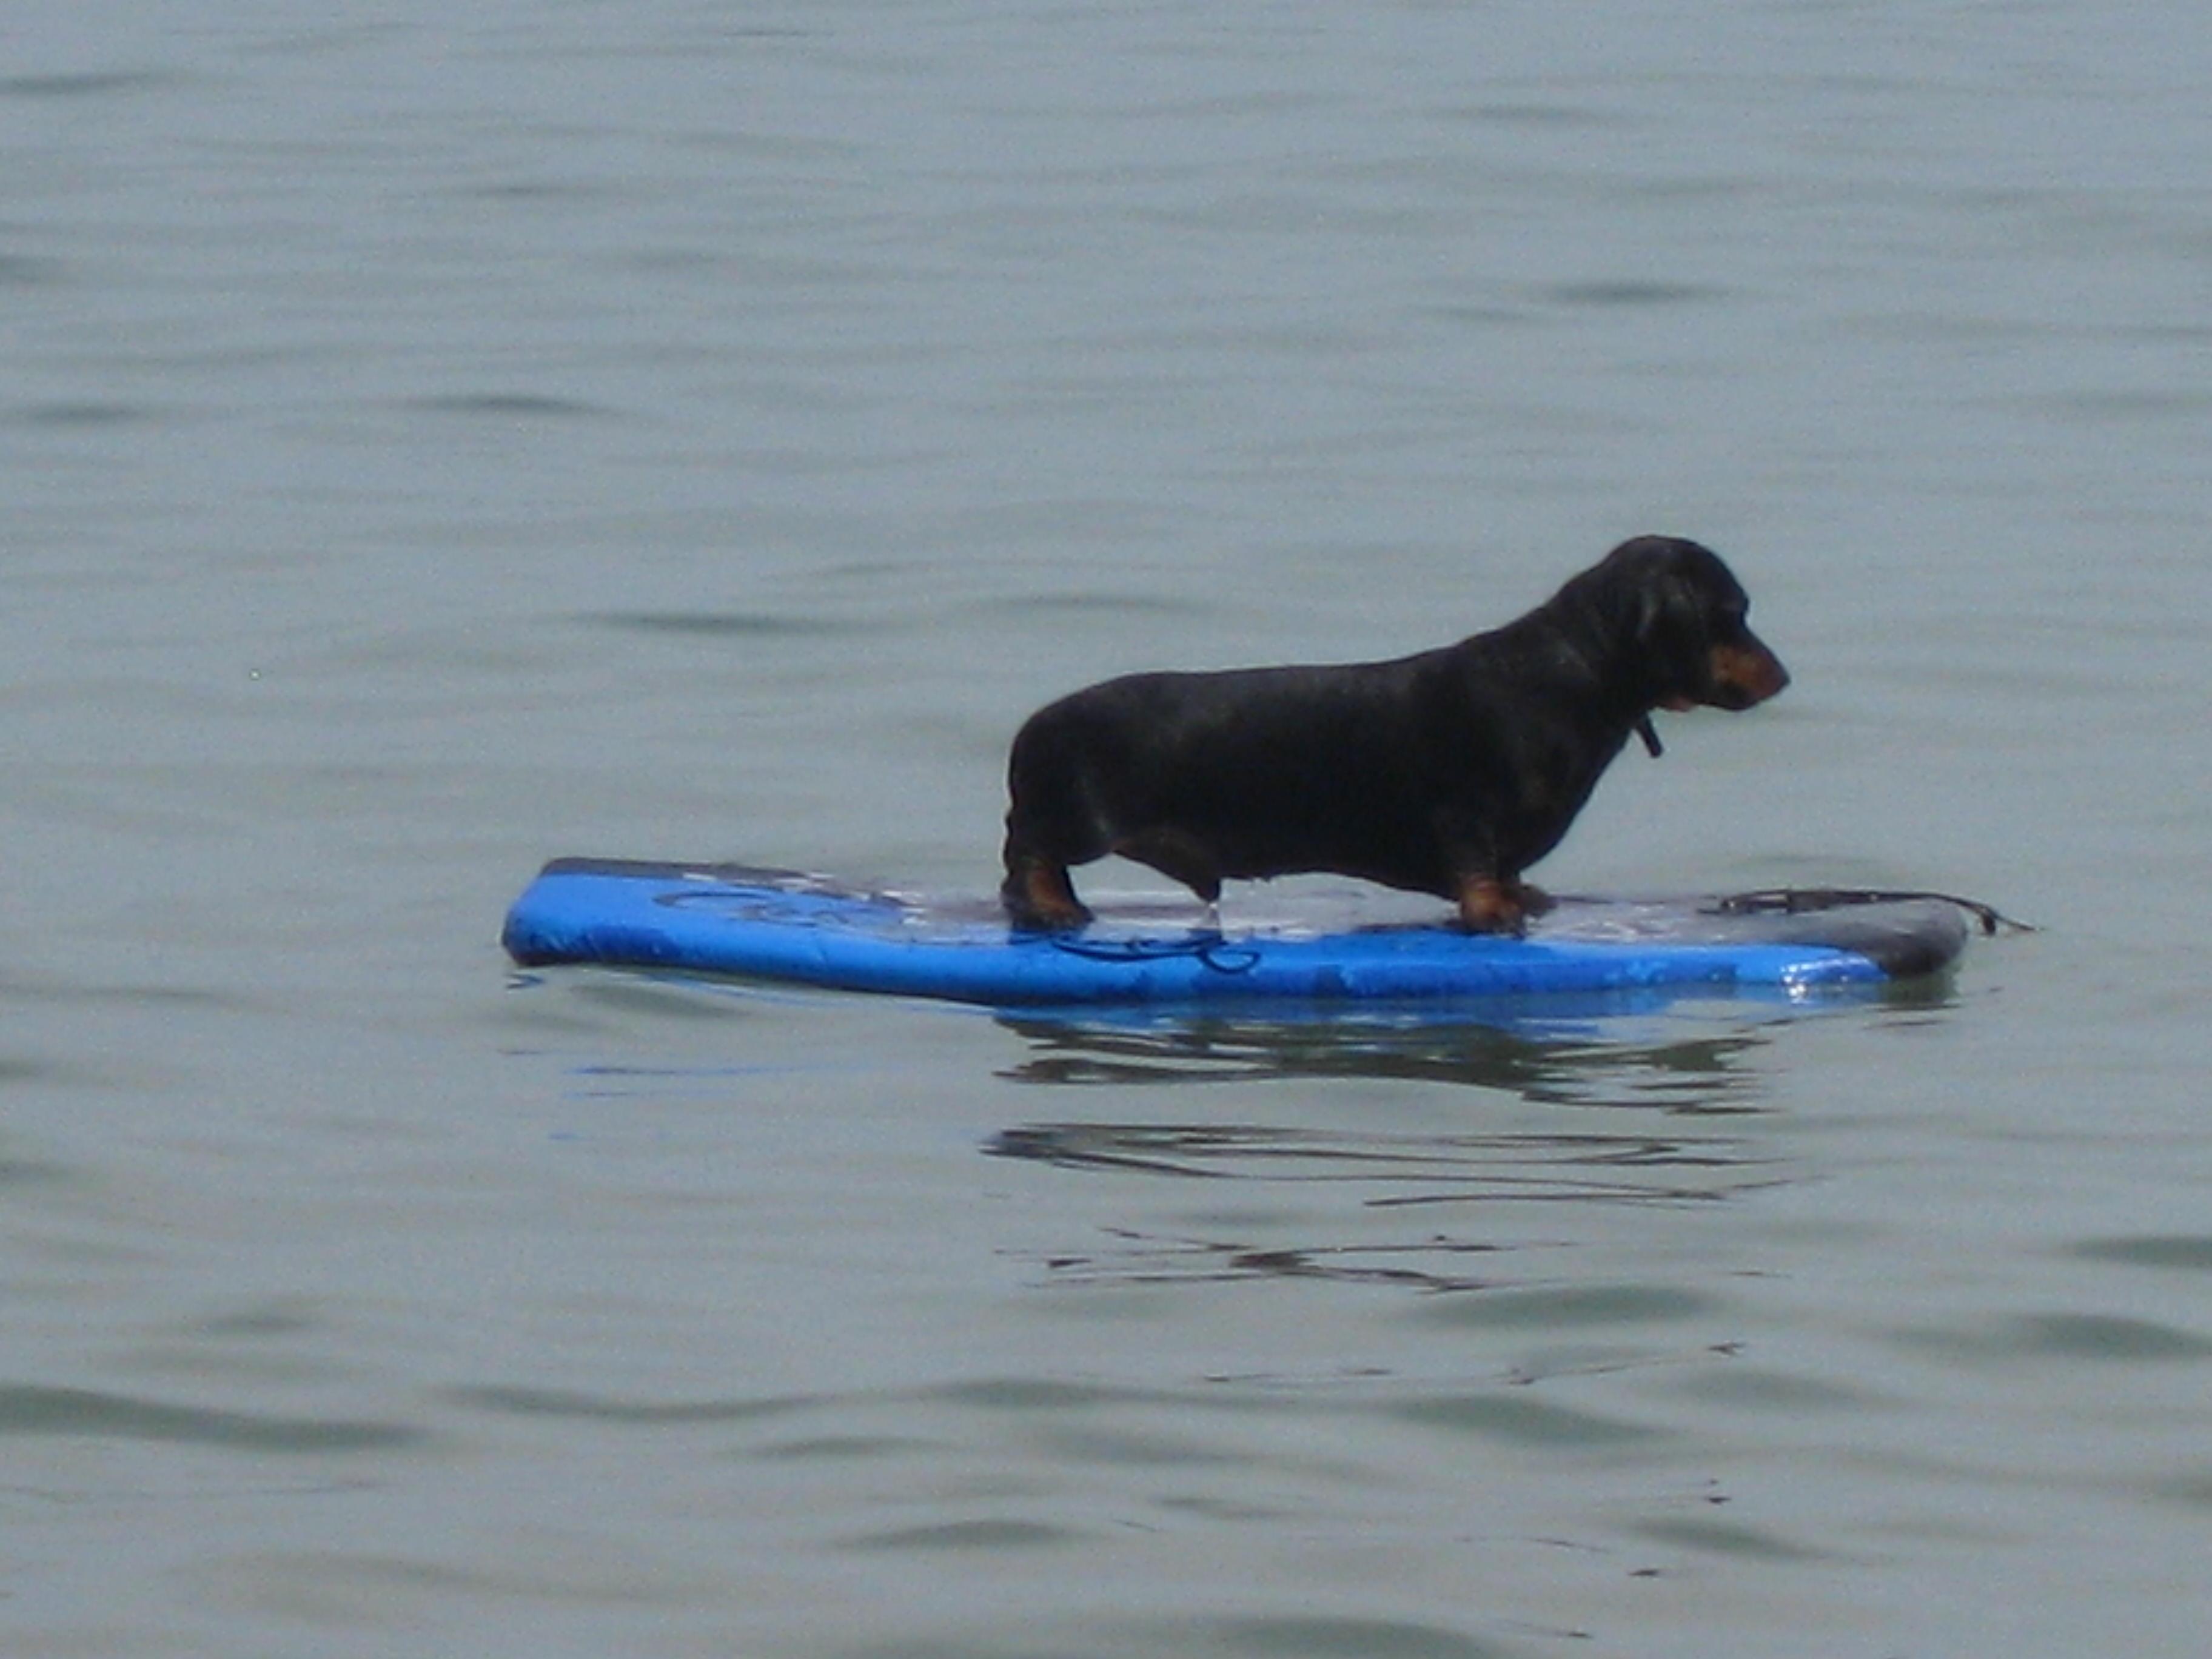 surfing dog. copyright Gretta Schifano